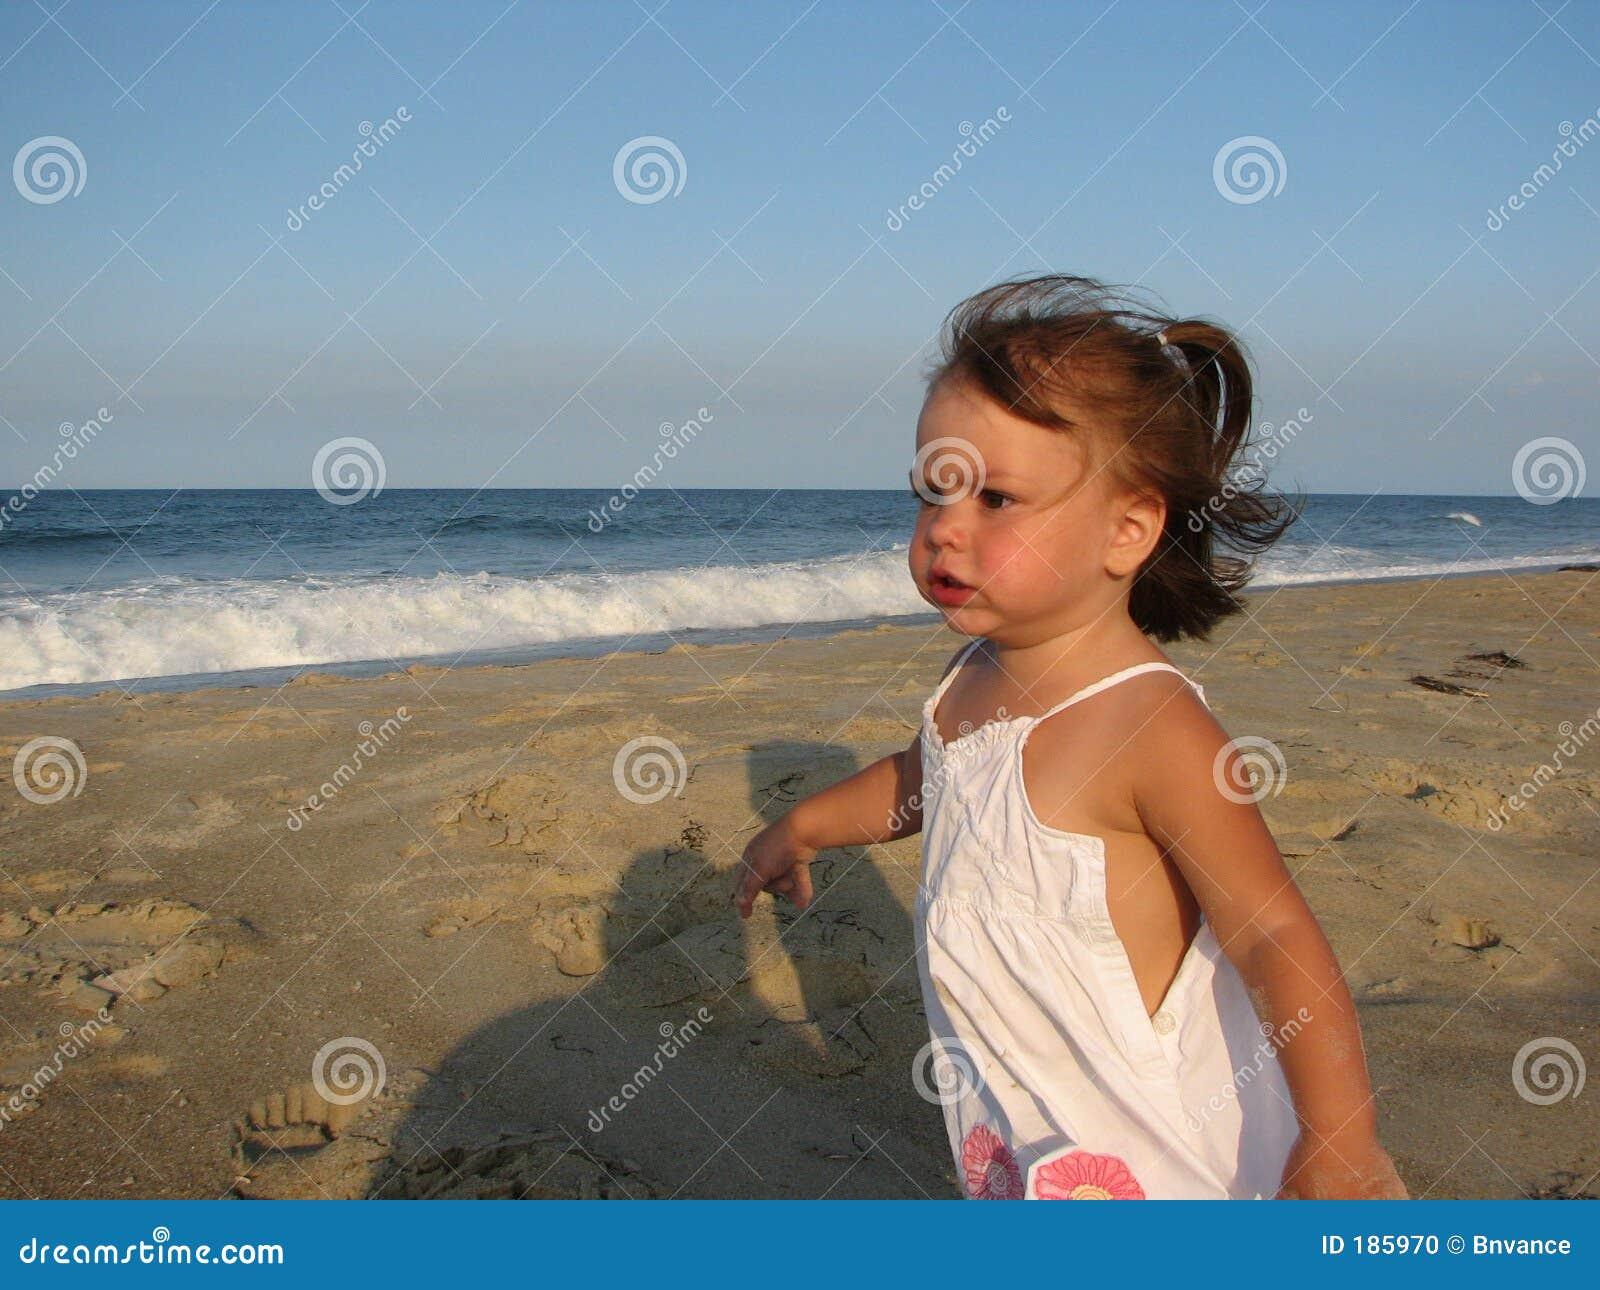 Girl Running On Beach Stock Photo - Image: 185970 Girl Running On Beach